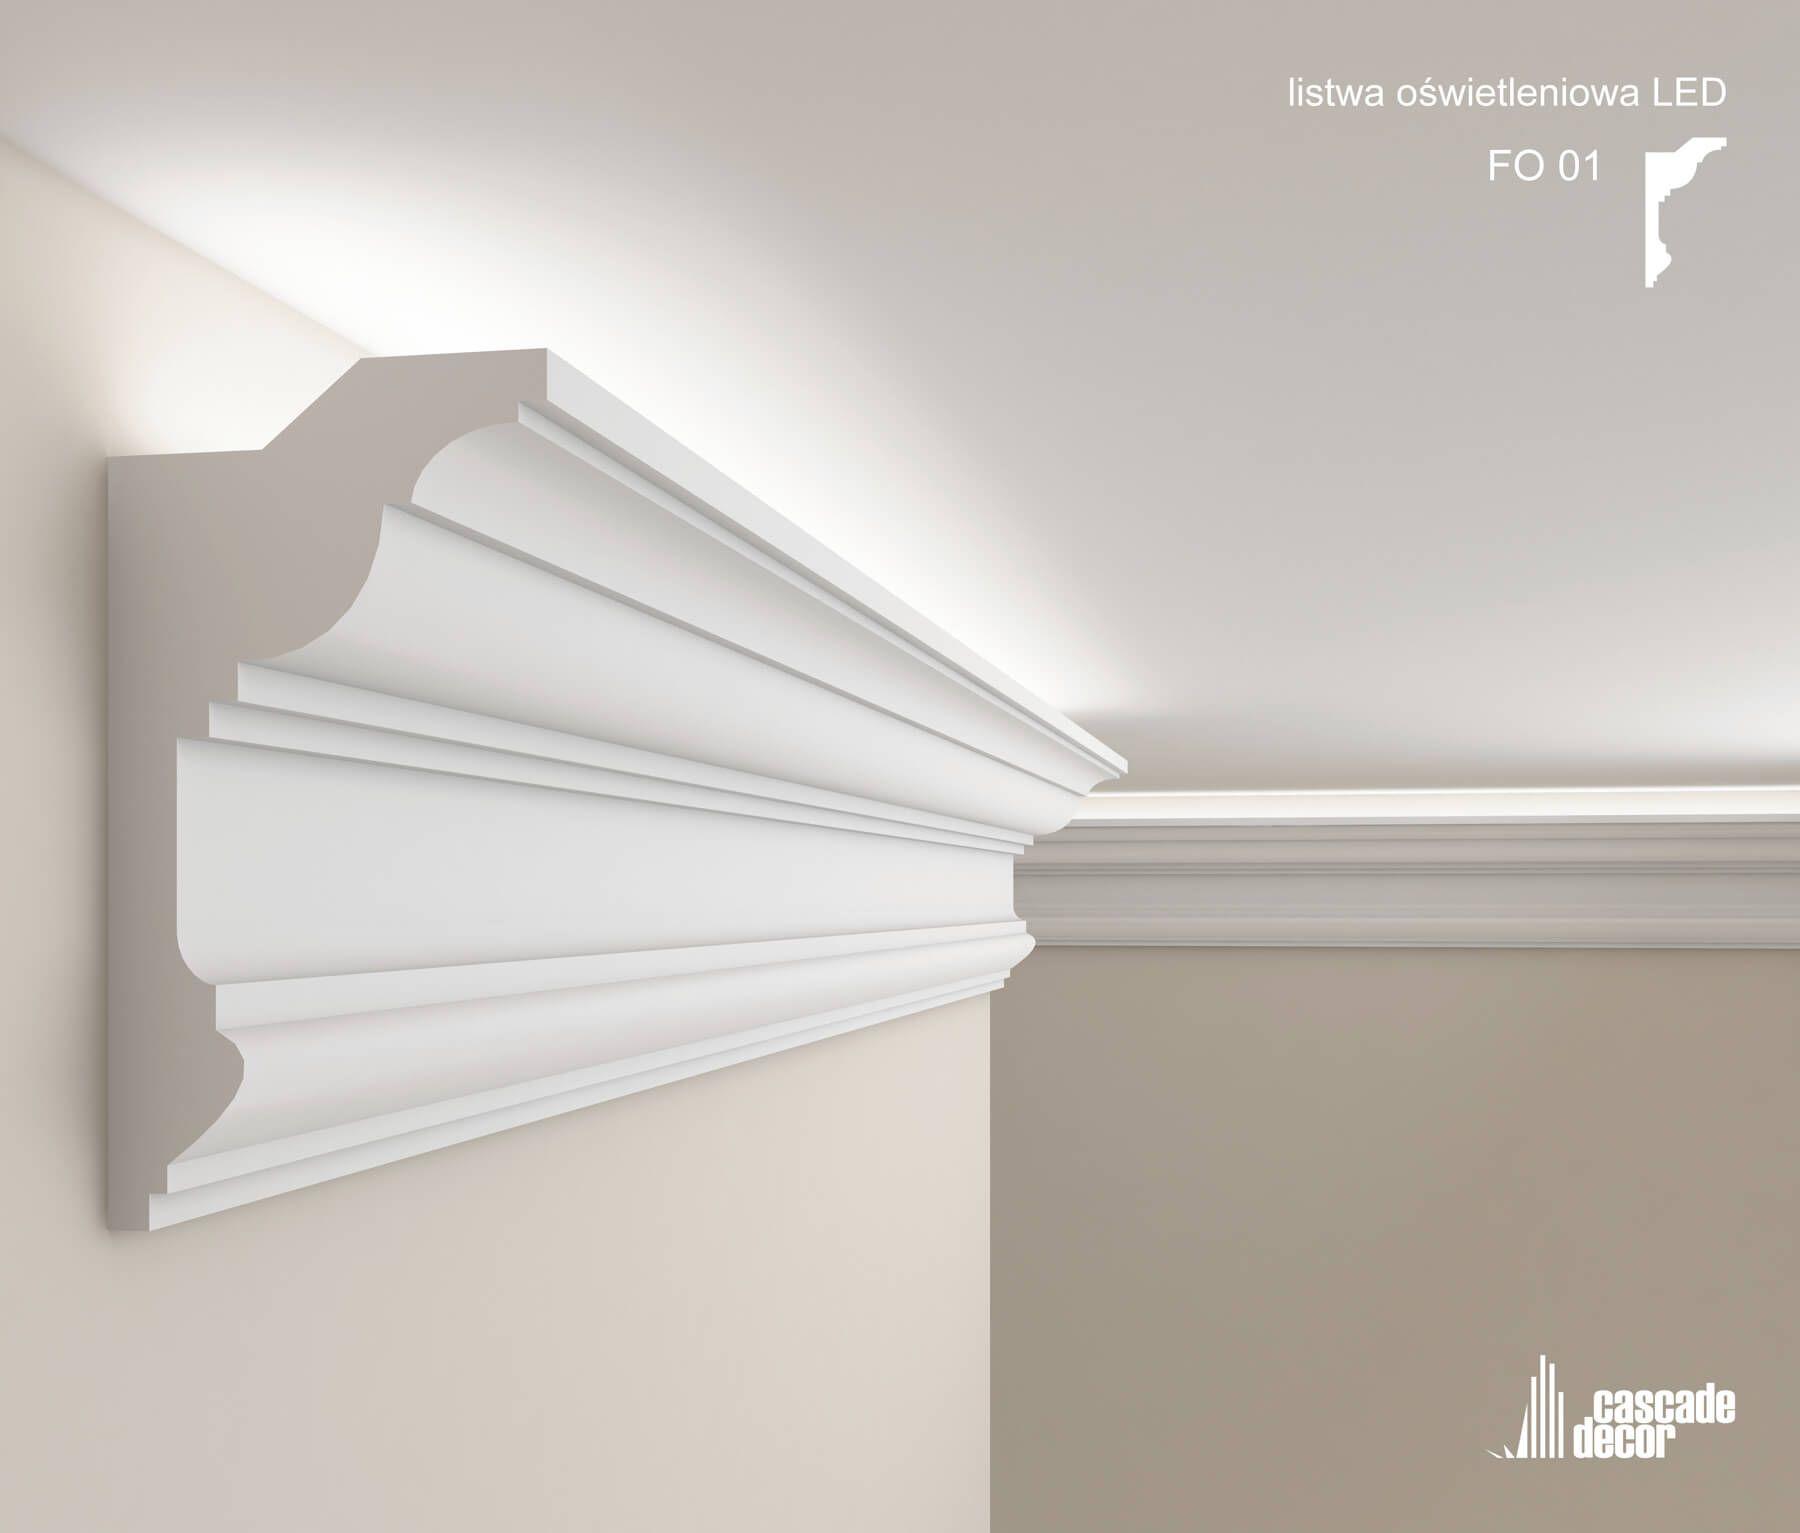 Corniche Polystyrène Pour Led gipsowe sztukaterie kupić | gipsonboard in 2019 | ceiling